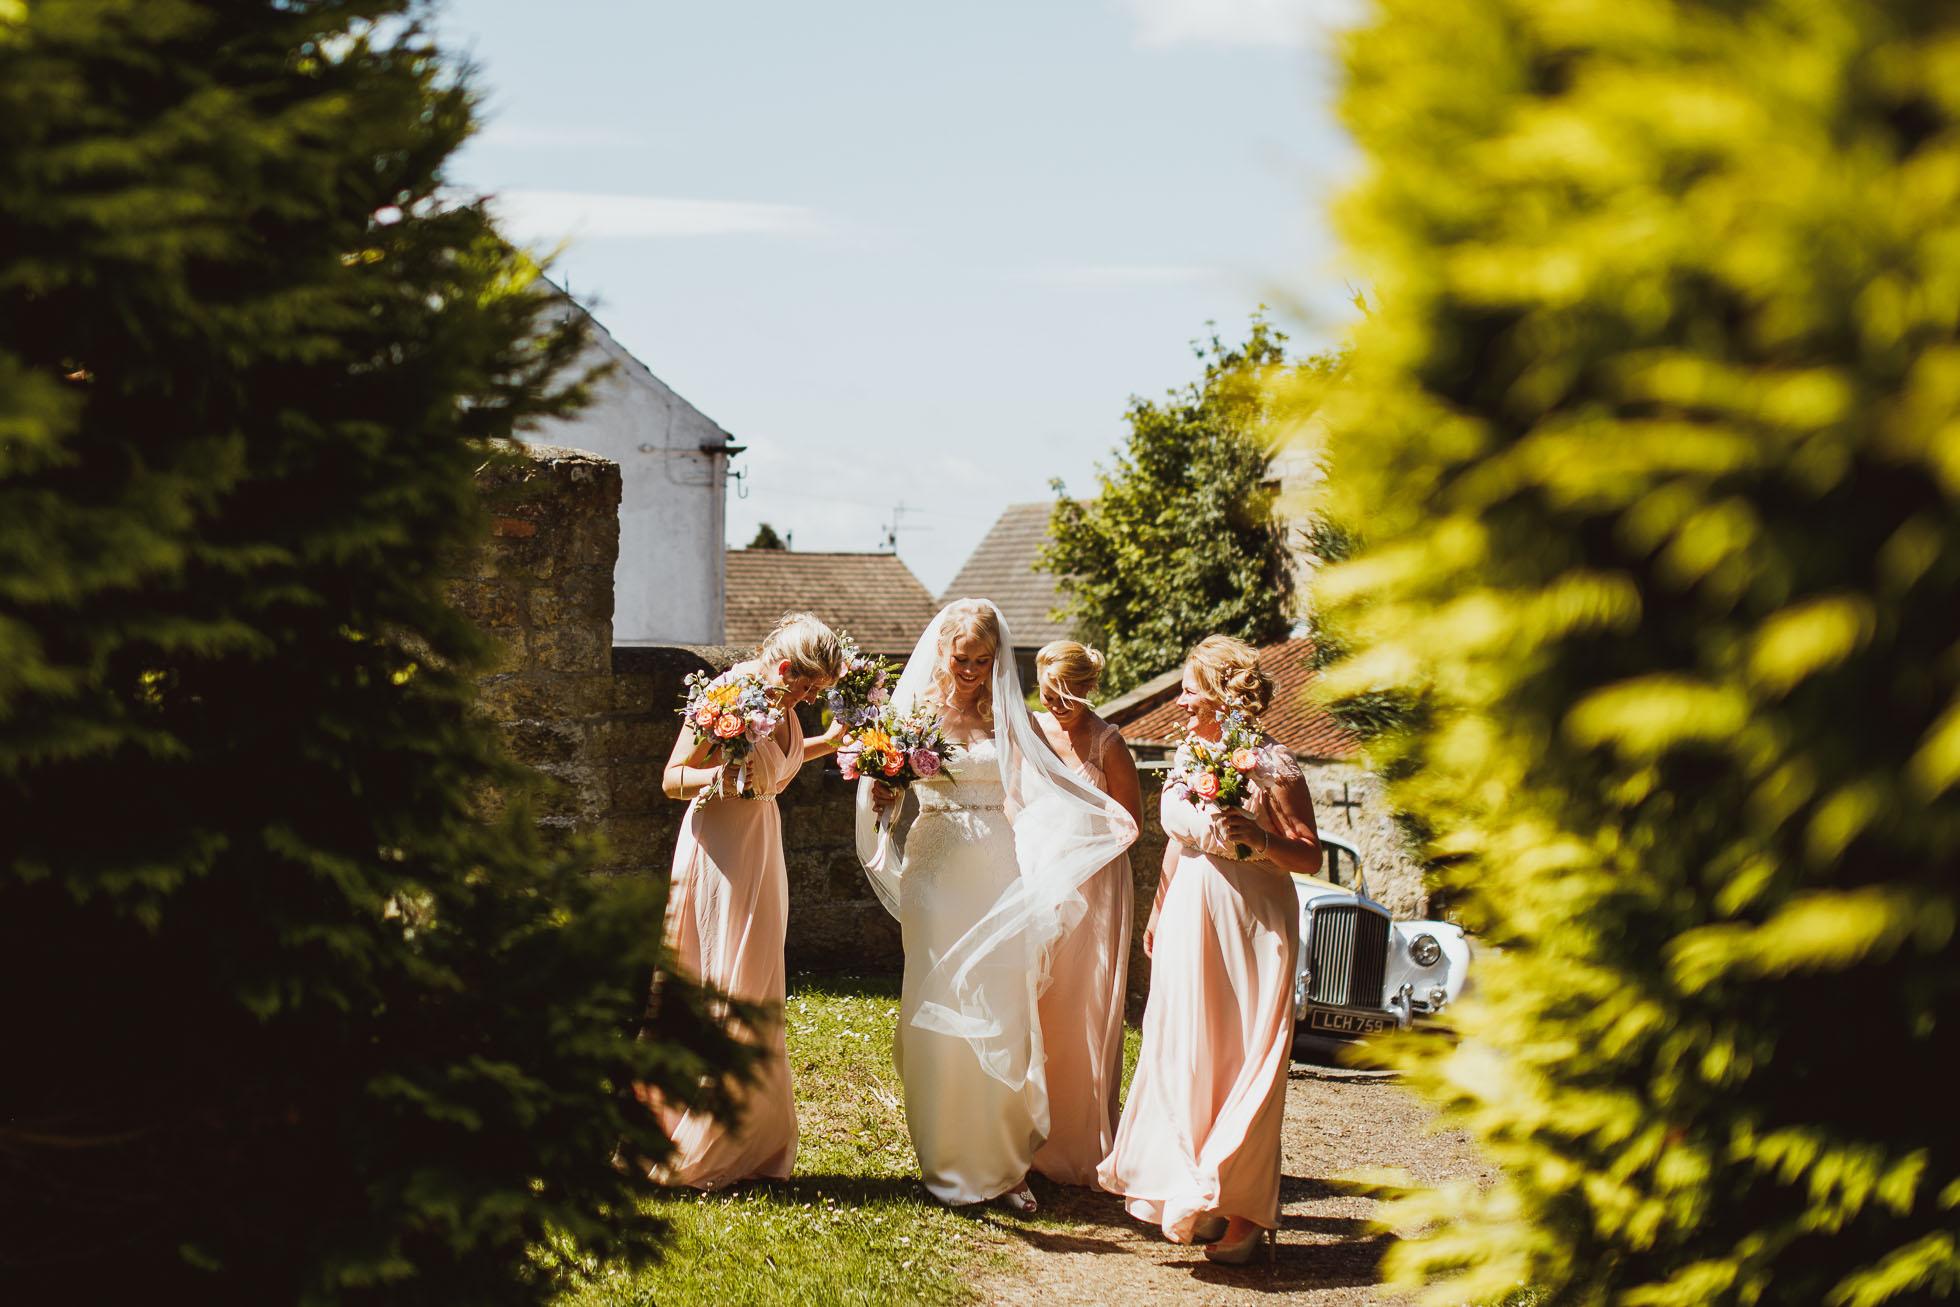 the_barn_scarborough_wedding_photographer-19.jpg